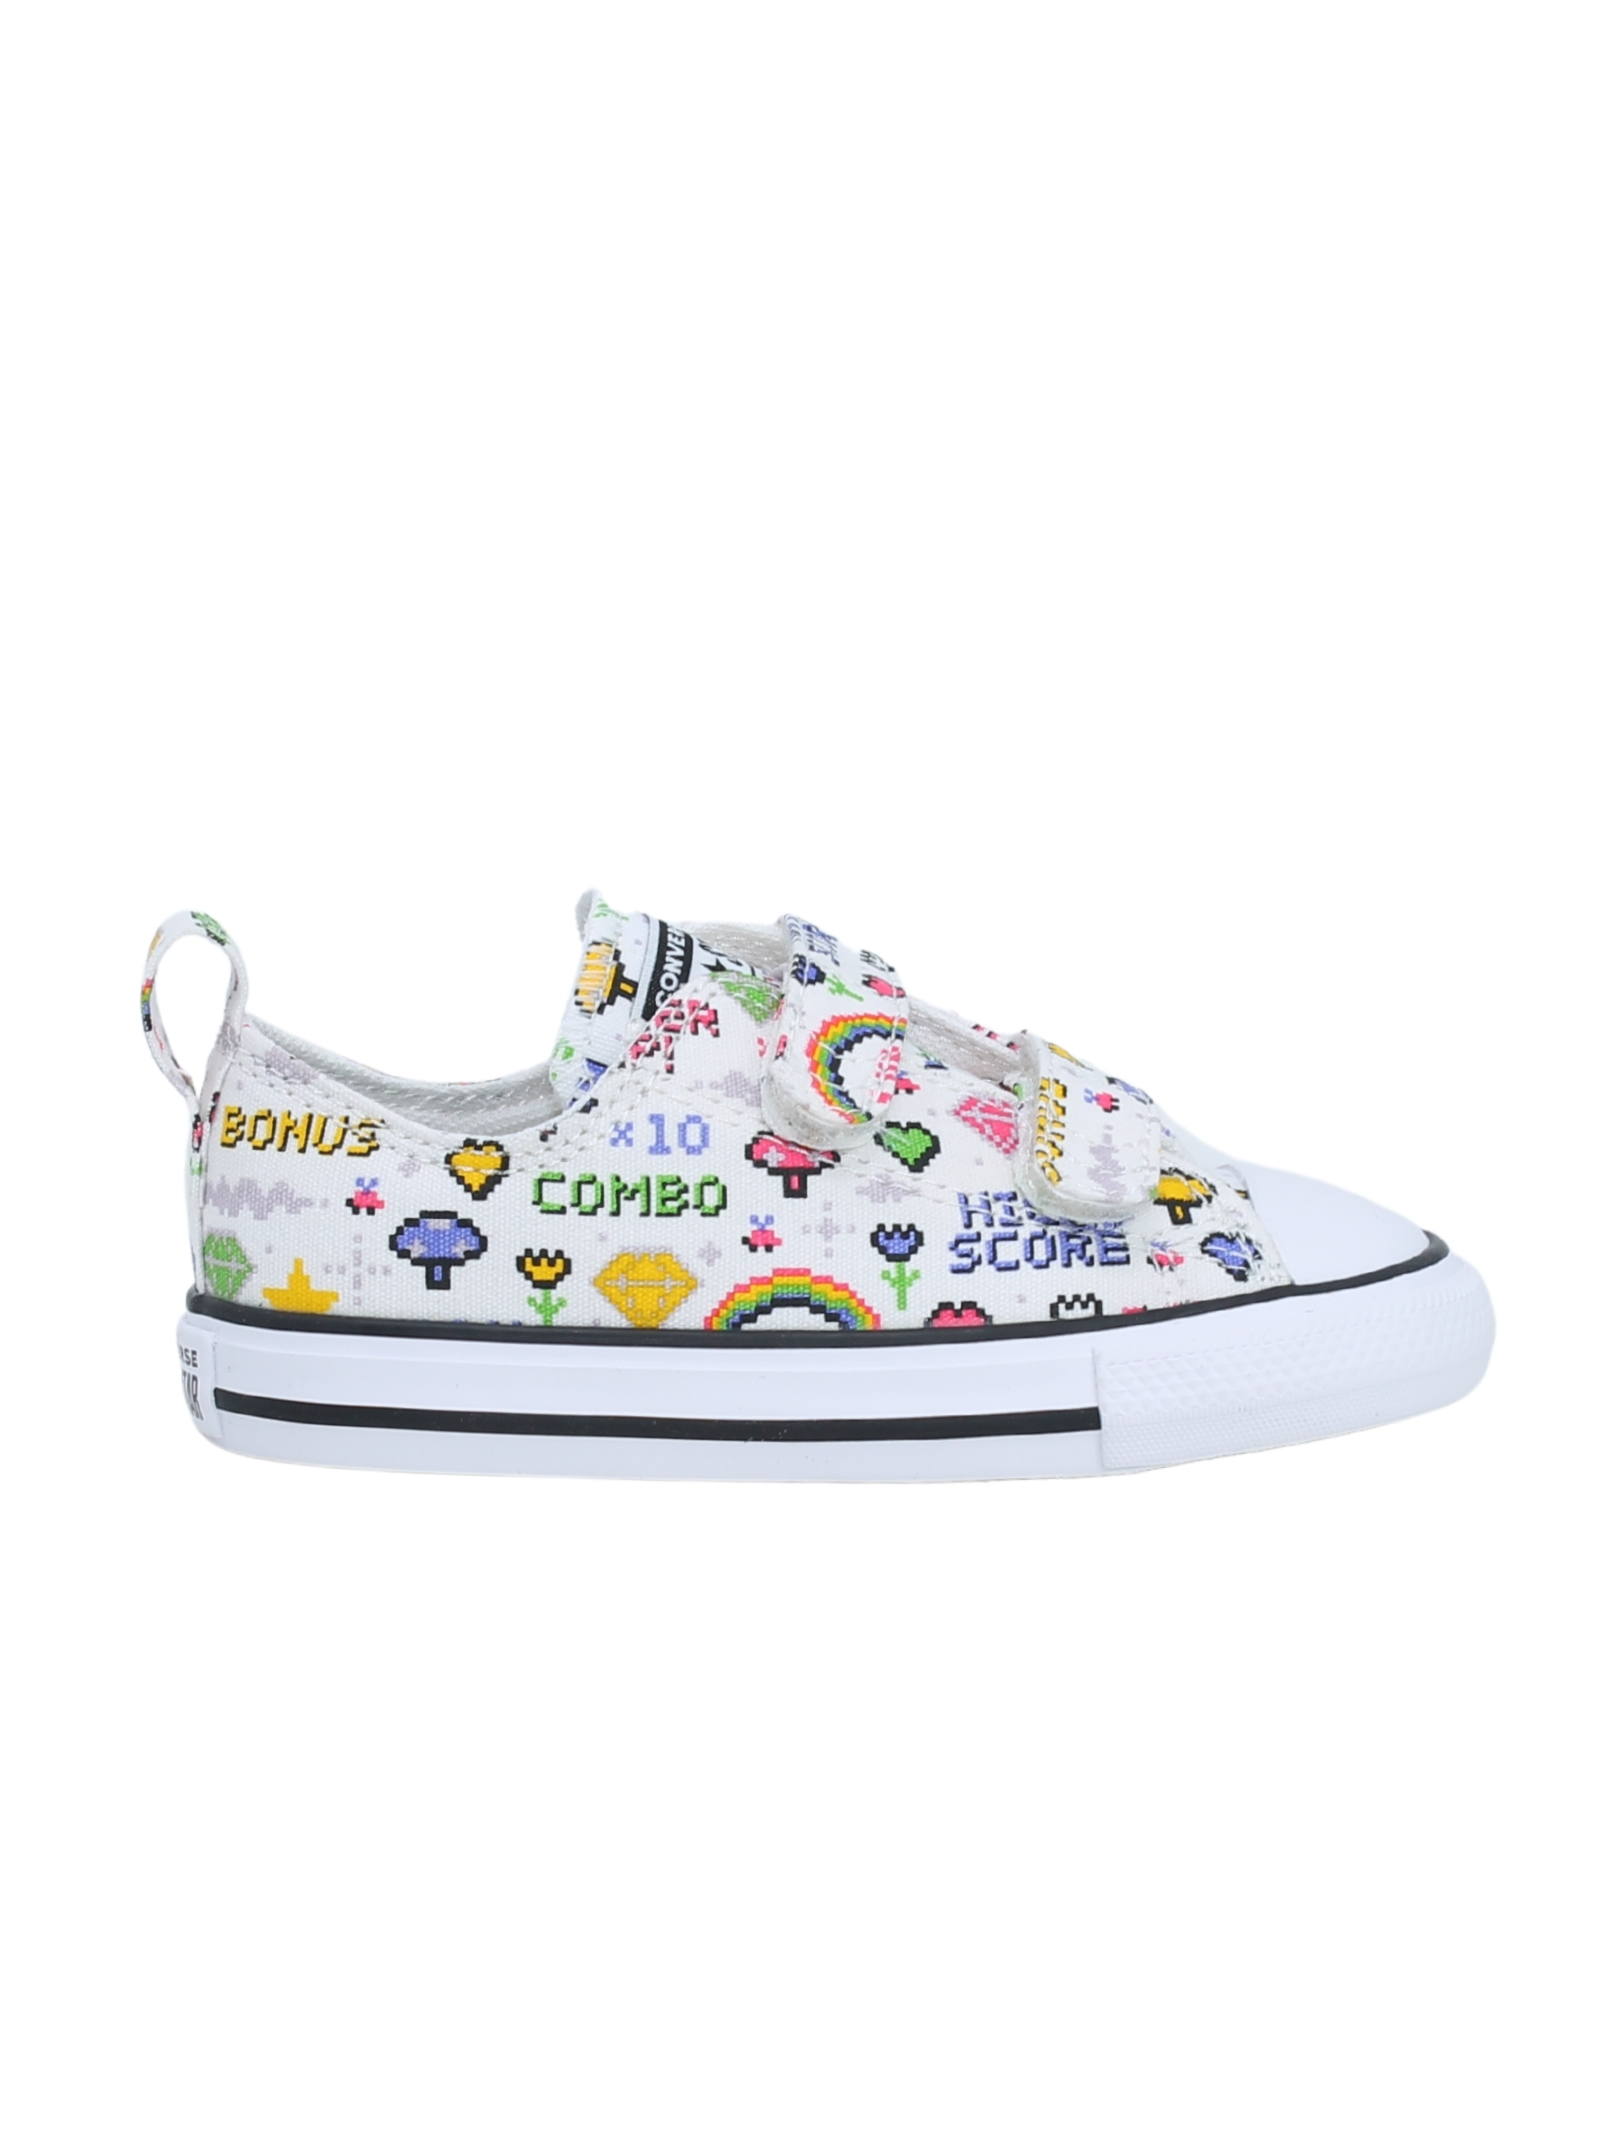 Converse Bambina Game CONVERSE KIDS | Sneakers | 770172CMULTICOLOR